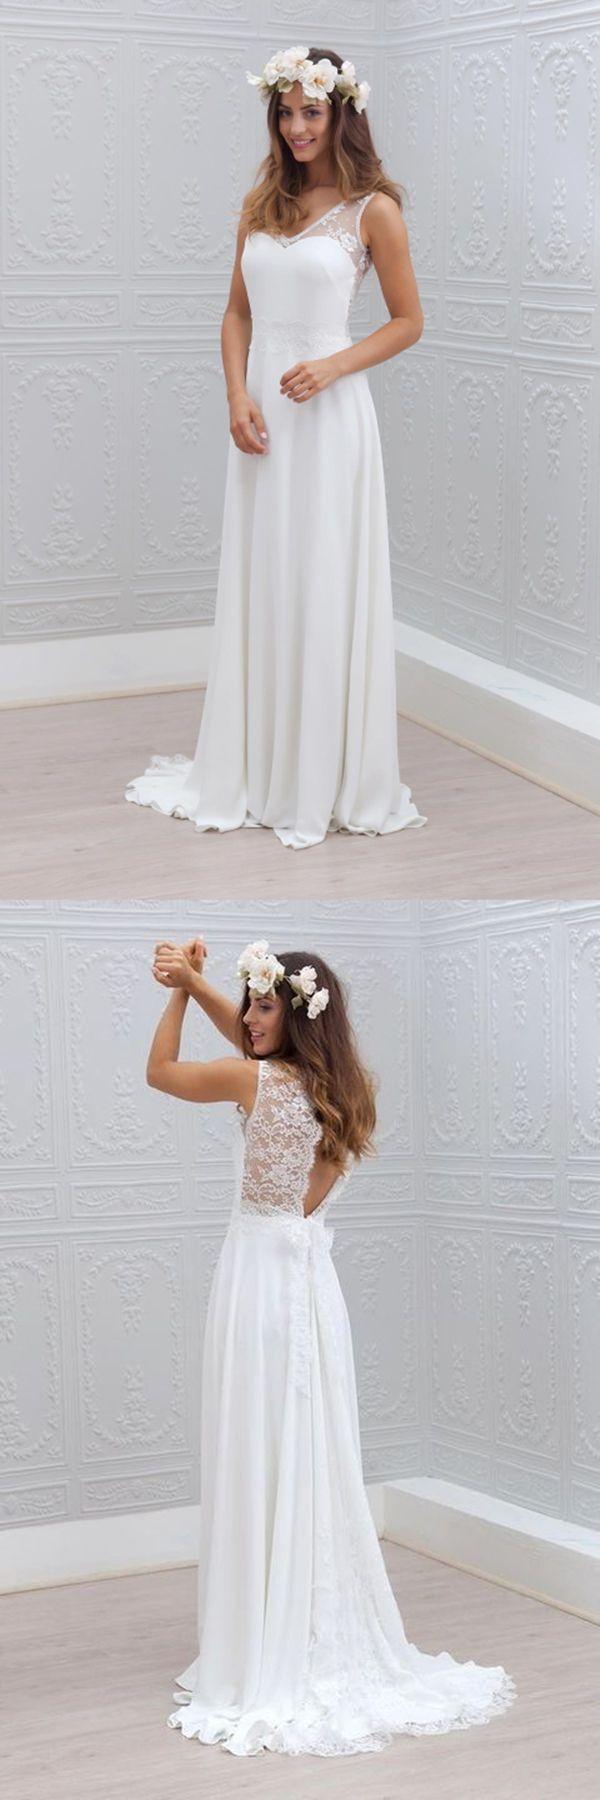 Top 25+ best Open back dresses ideas on Pinterest | Back dresses ...